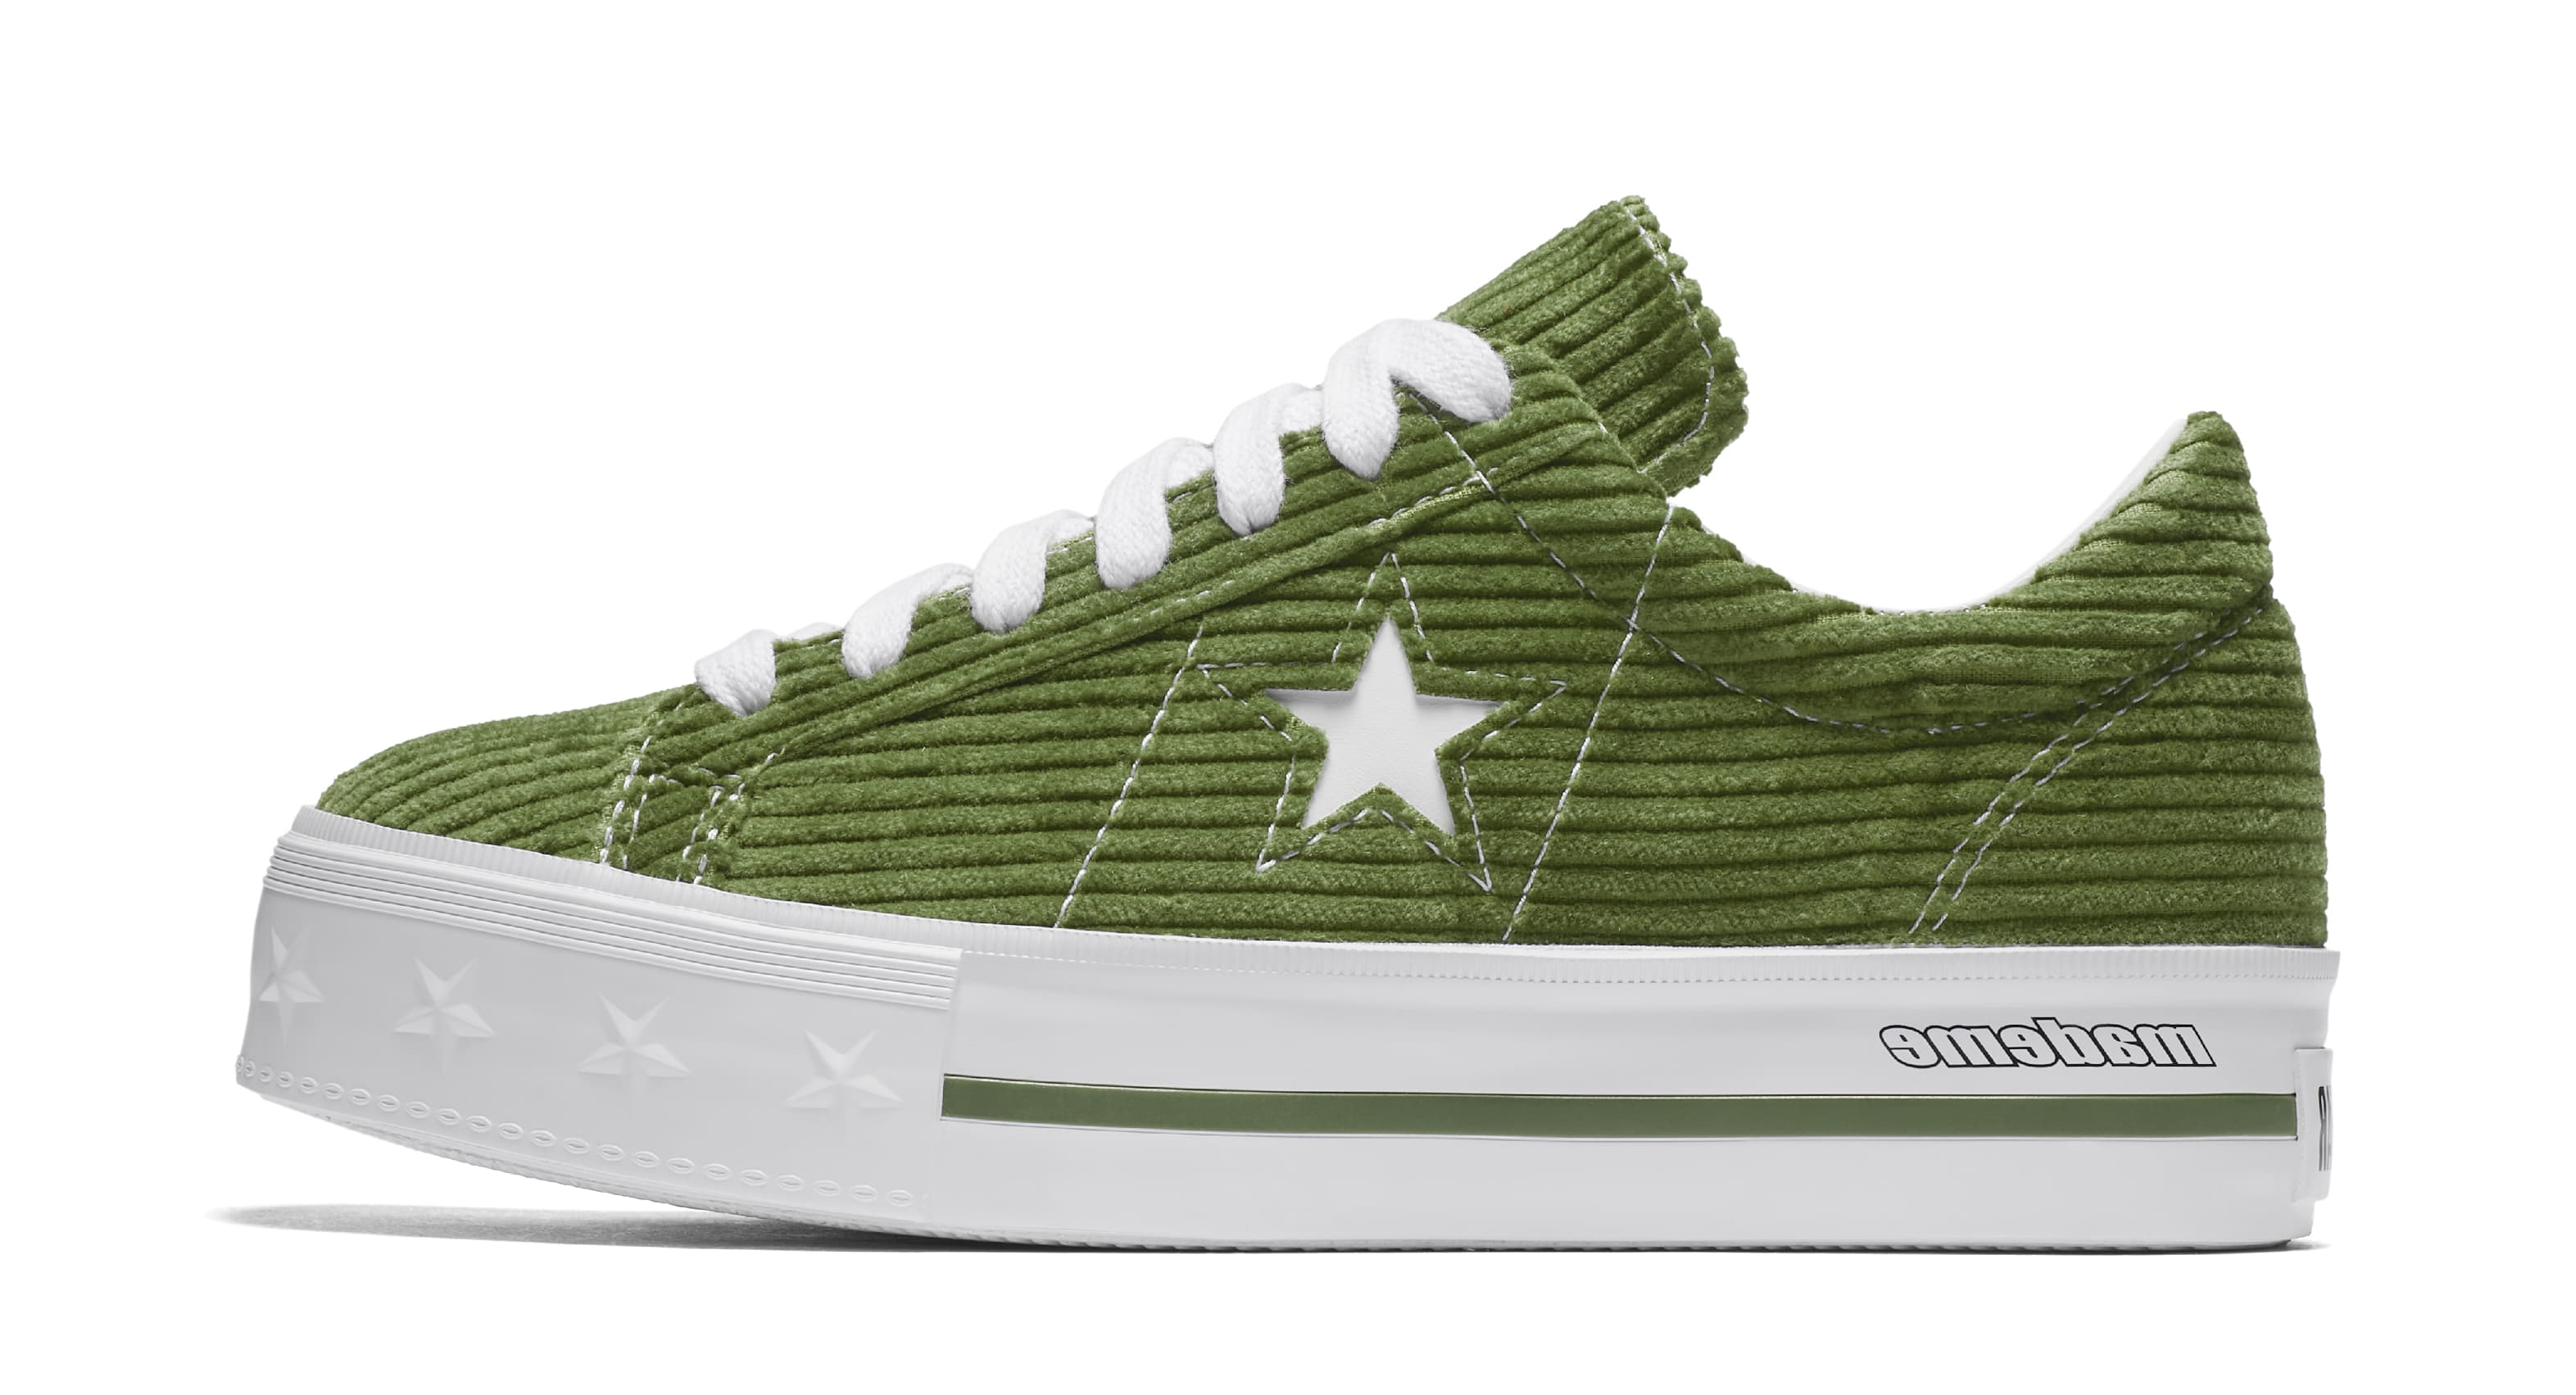 Mademe x Converse One Star 'Garden Green' (Lateral)